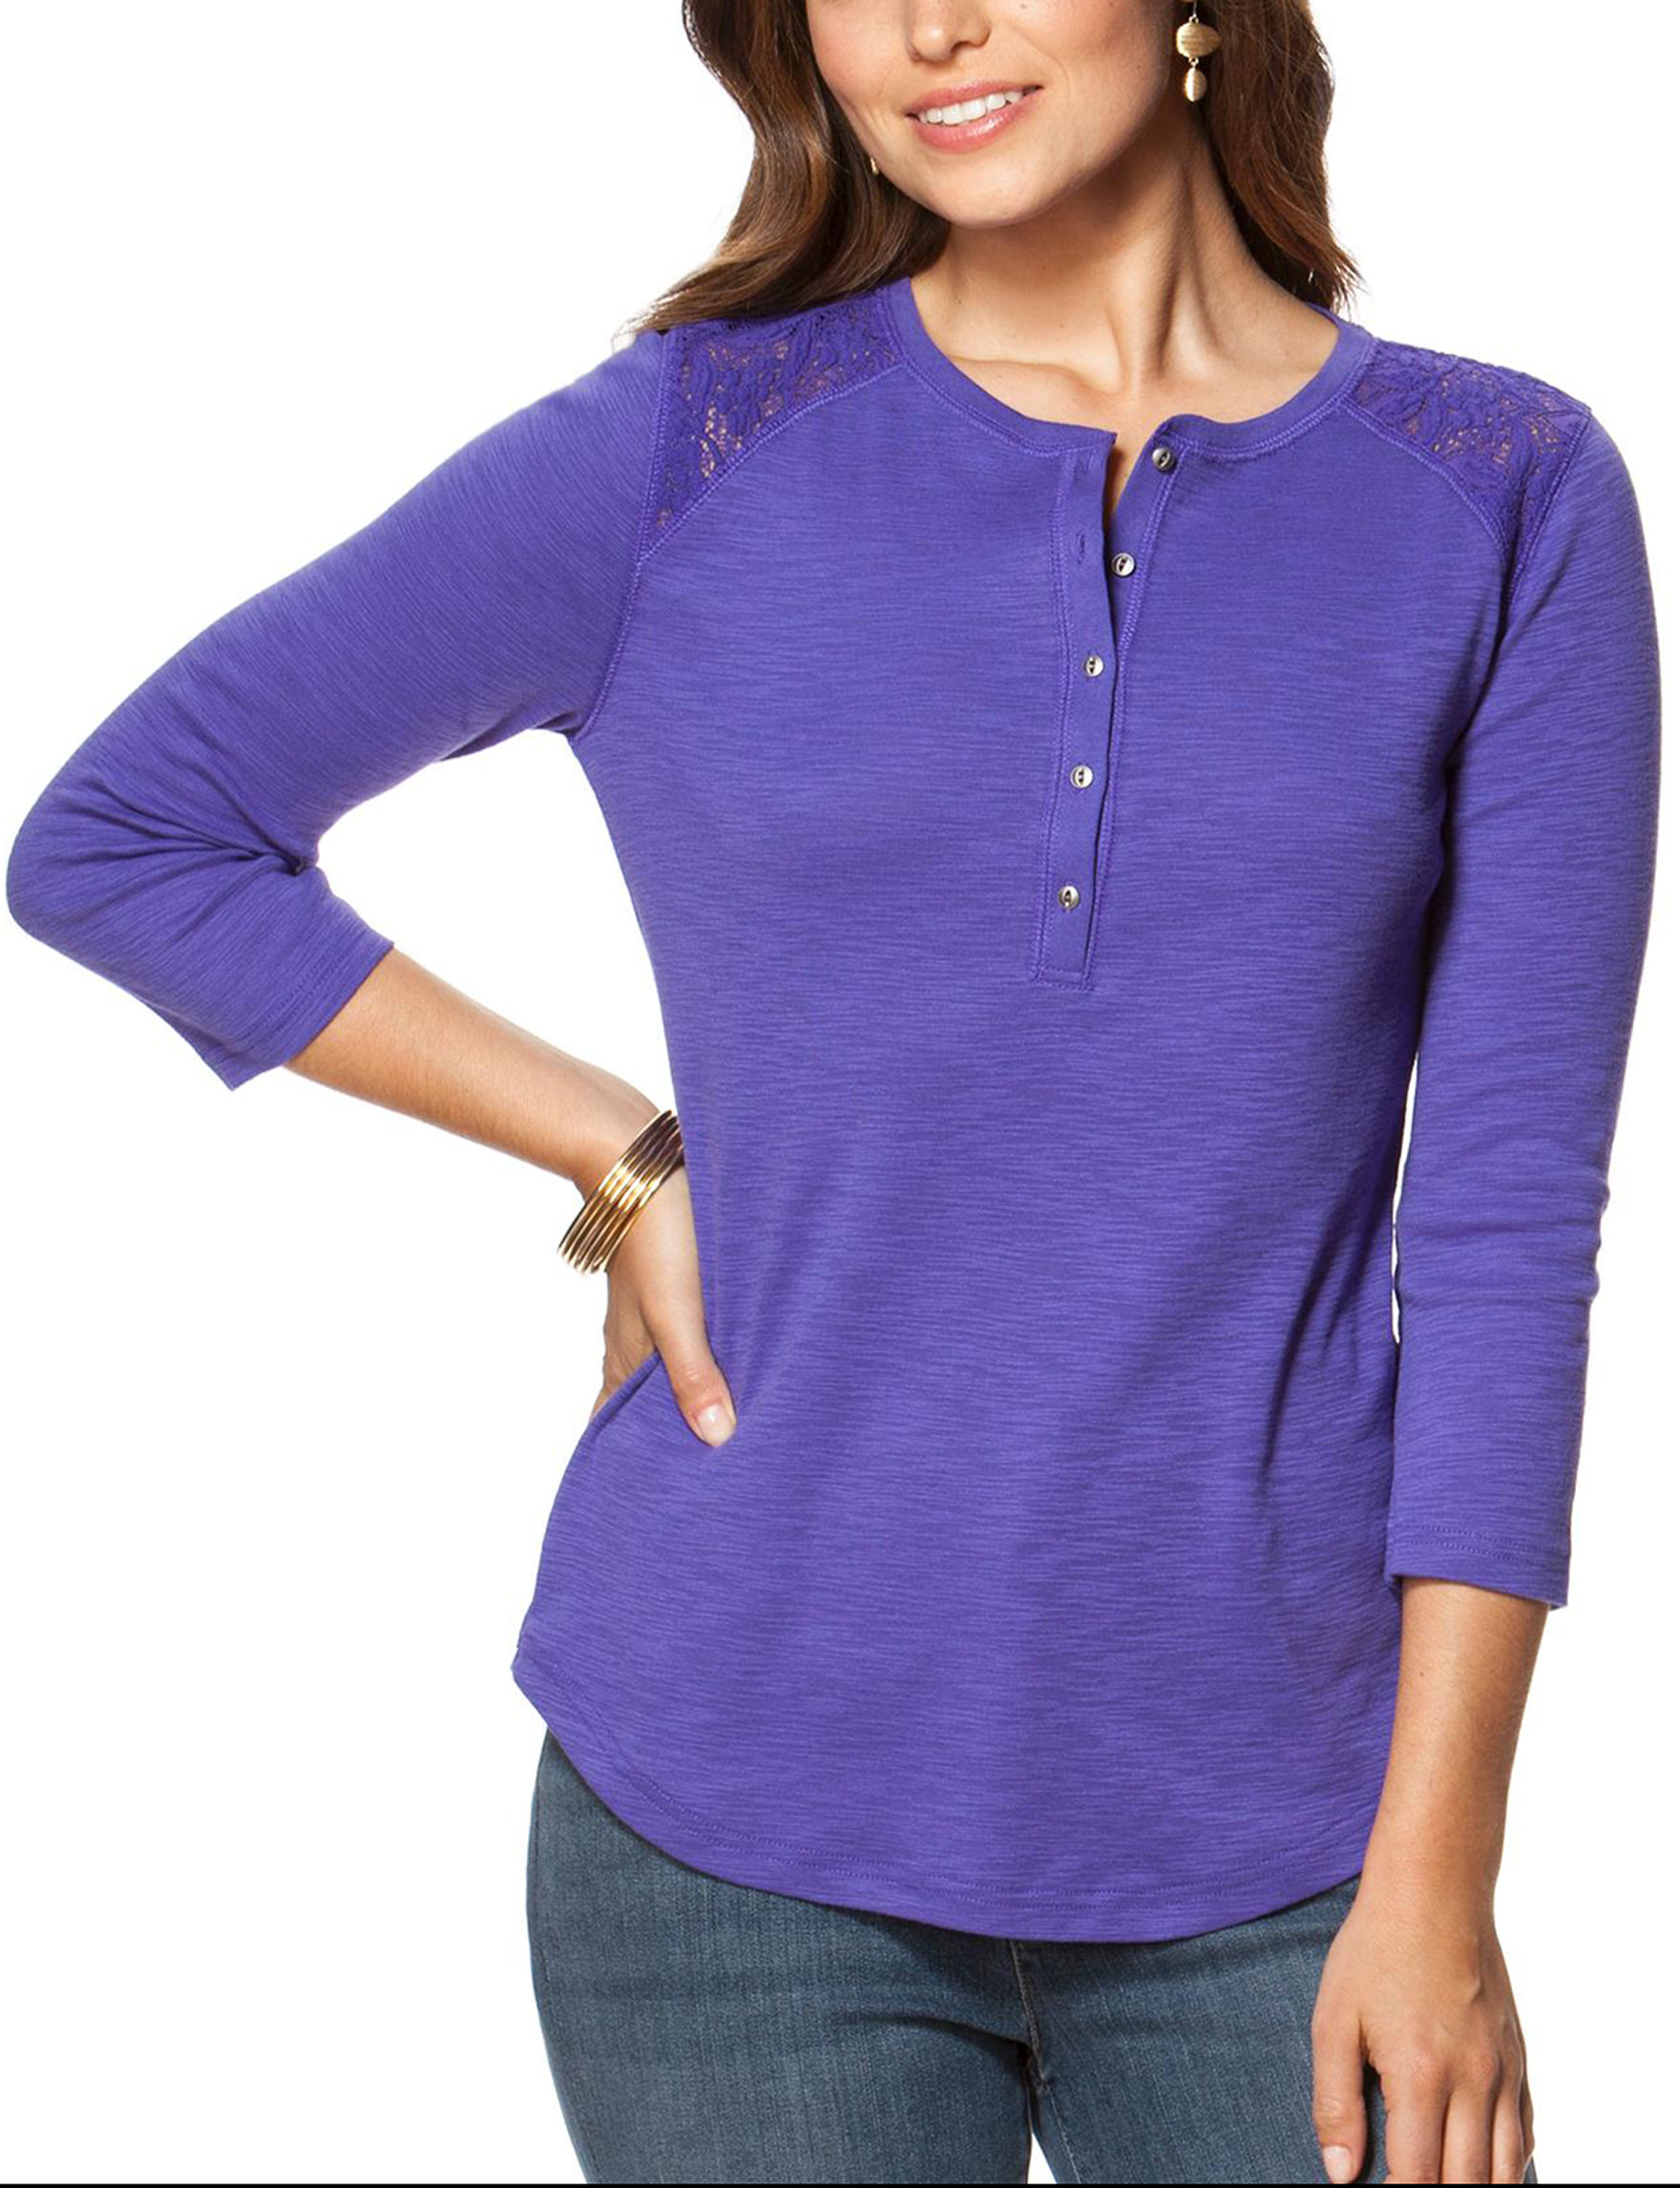 Chaps Purple